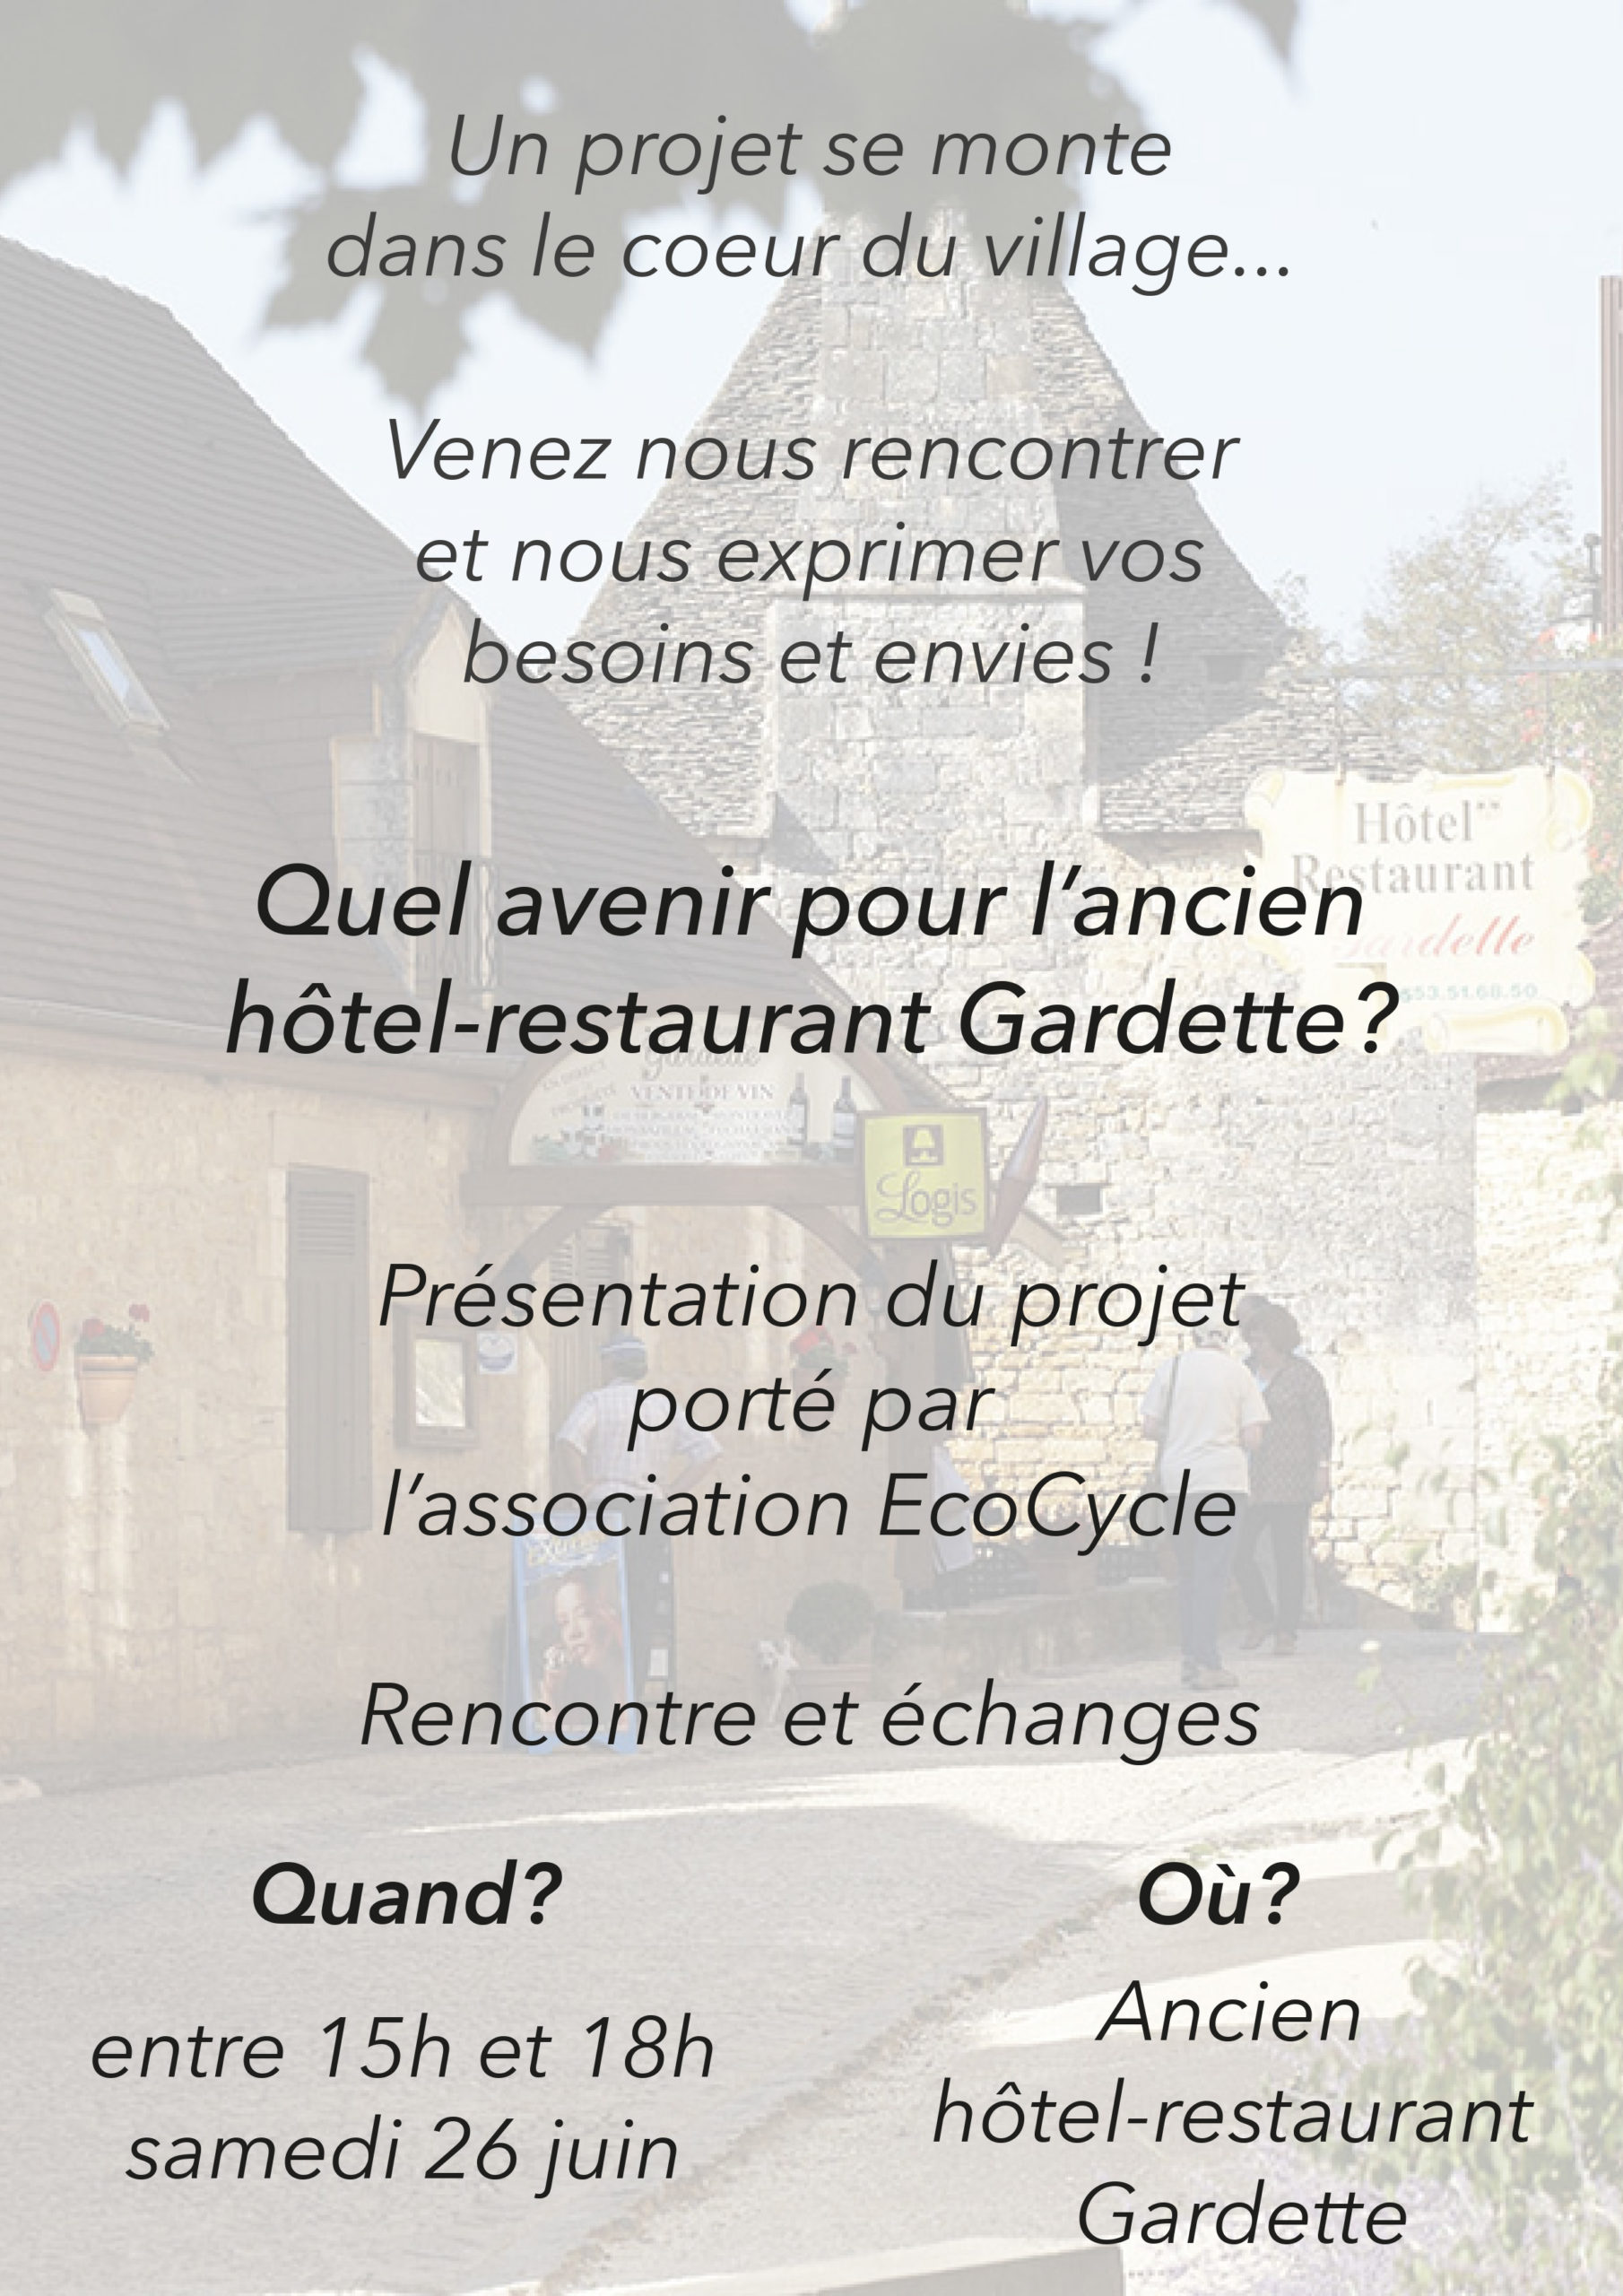 Hotel restaurant La Gardette